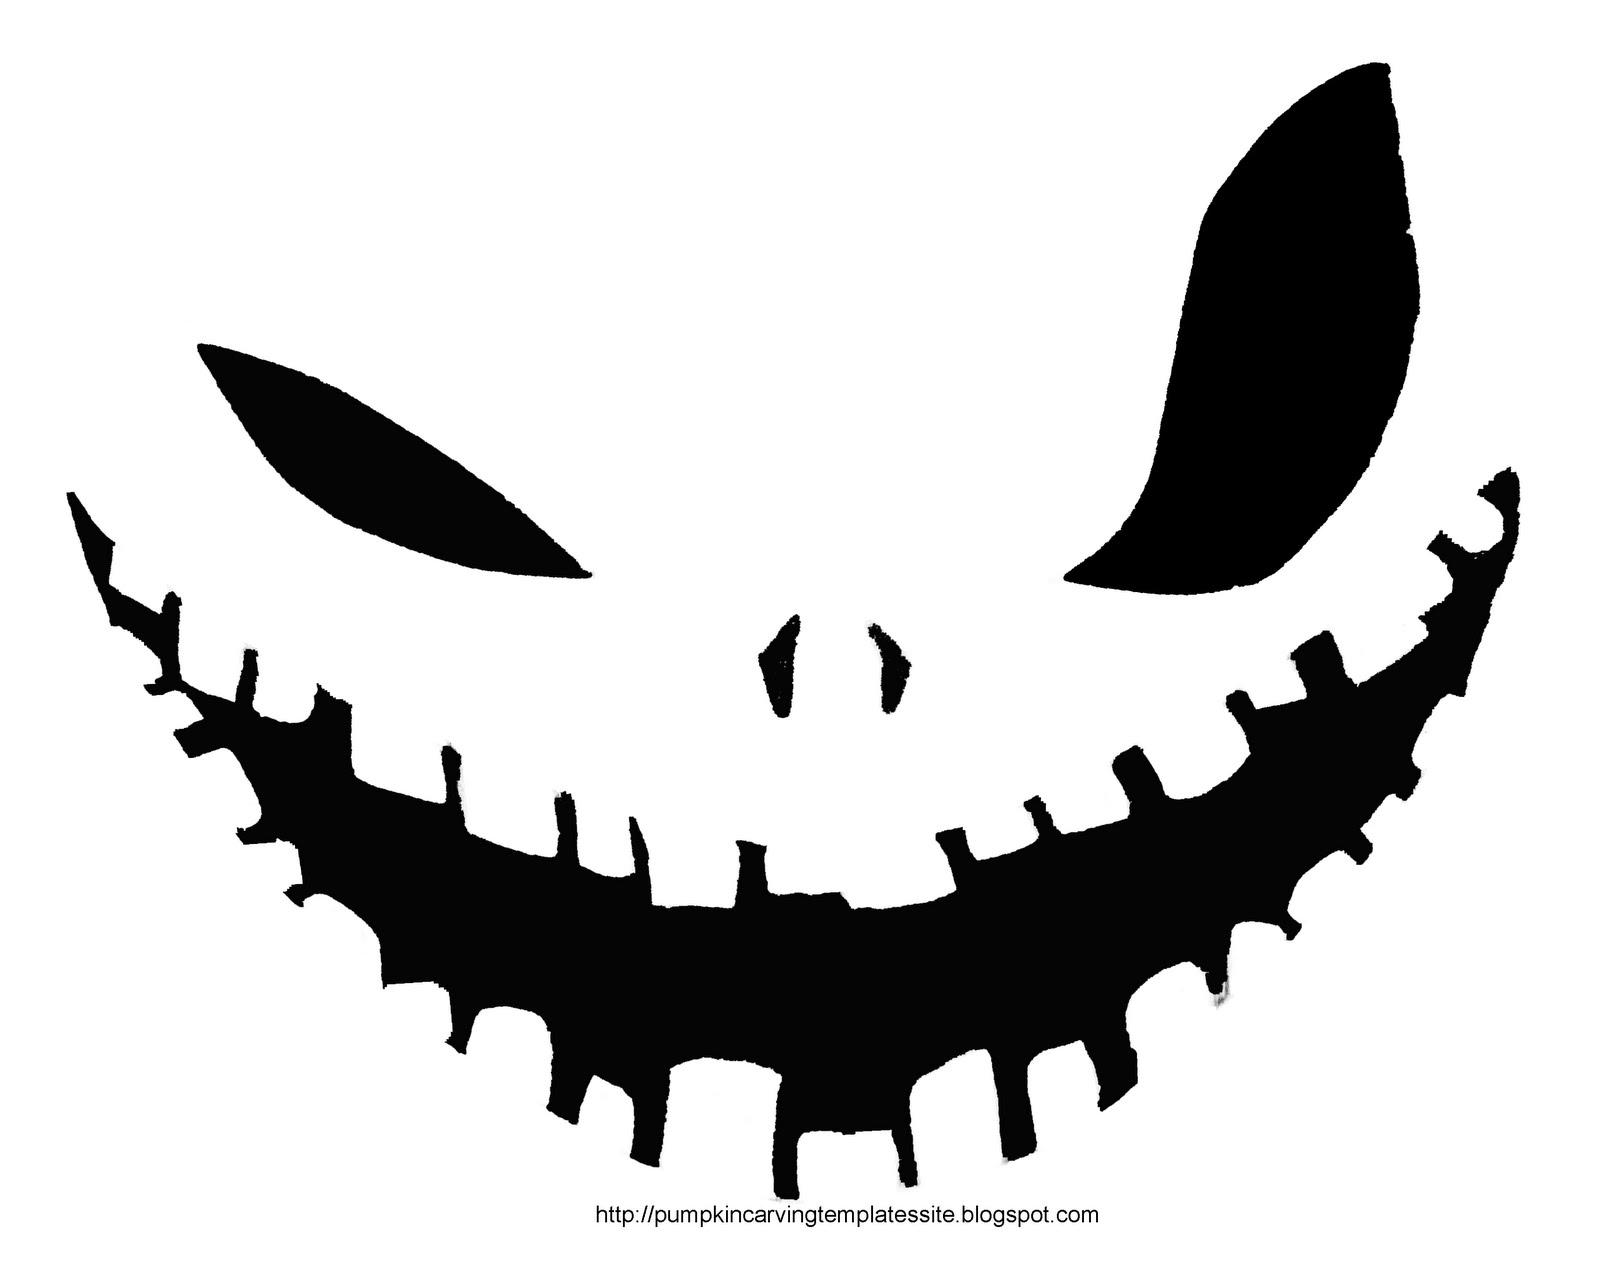 pumpkin outlines printable | free download best pumpkin outlines